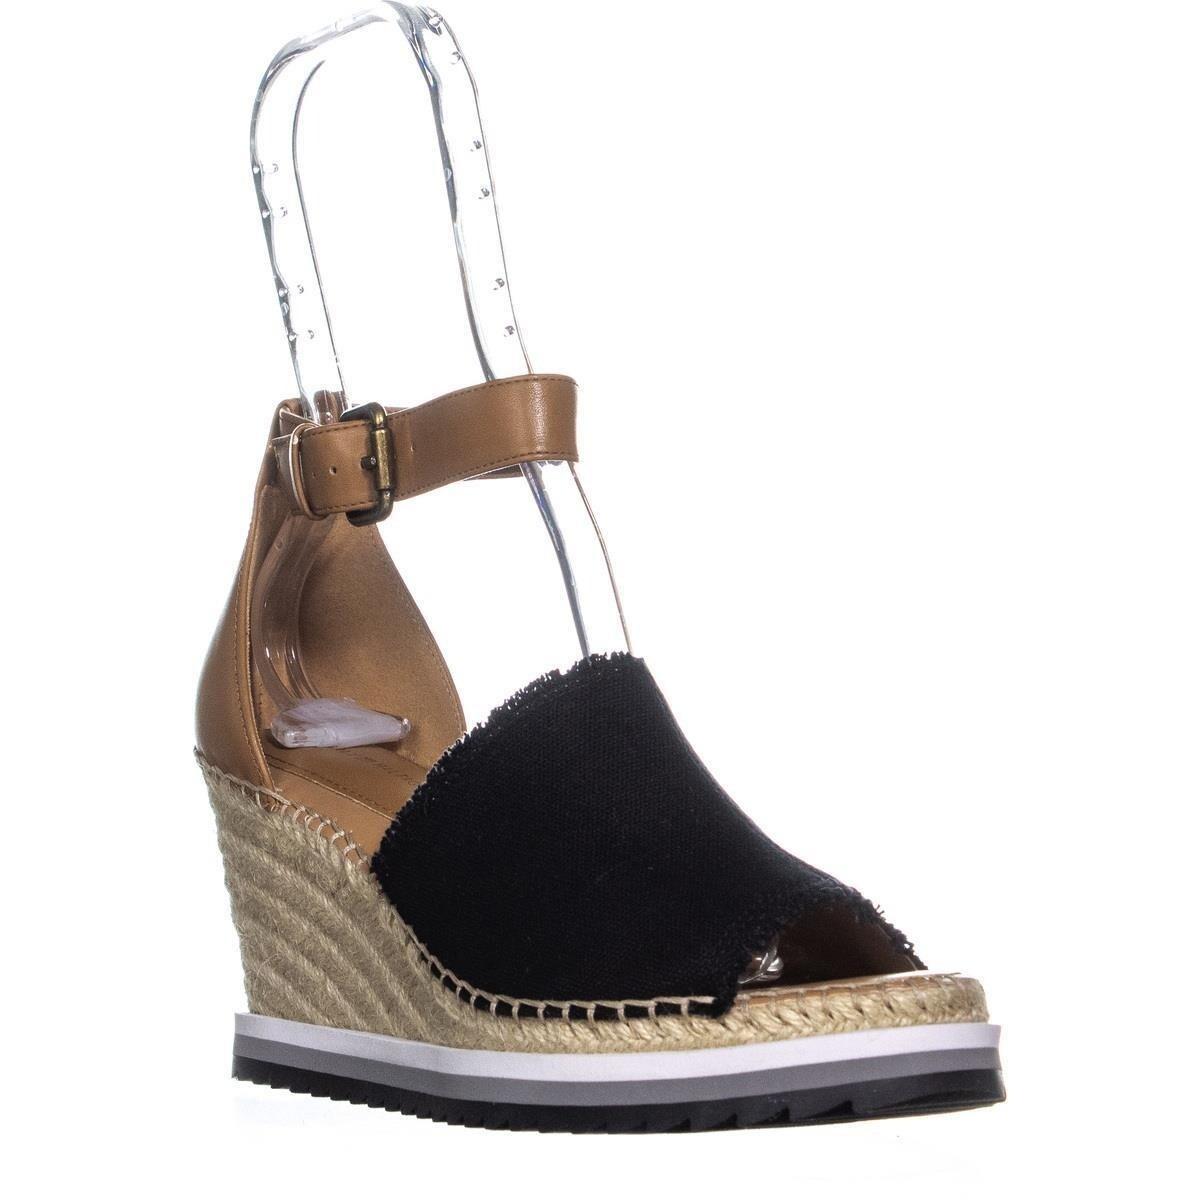 8d7ba68a97f Tommy Hilfiger Yavino Ankle Strap Wedge Sandals, Black Multi